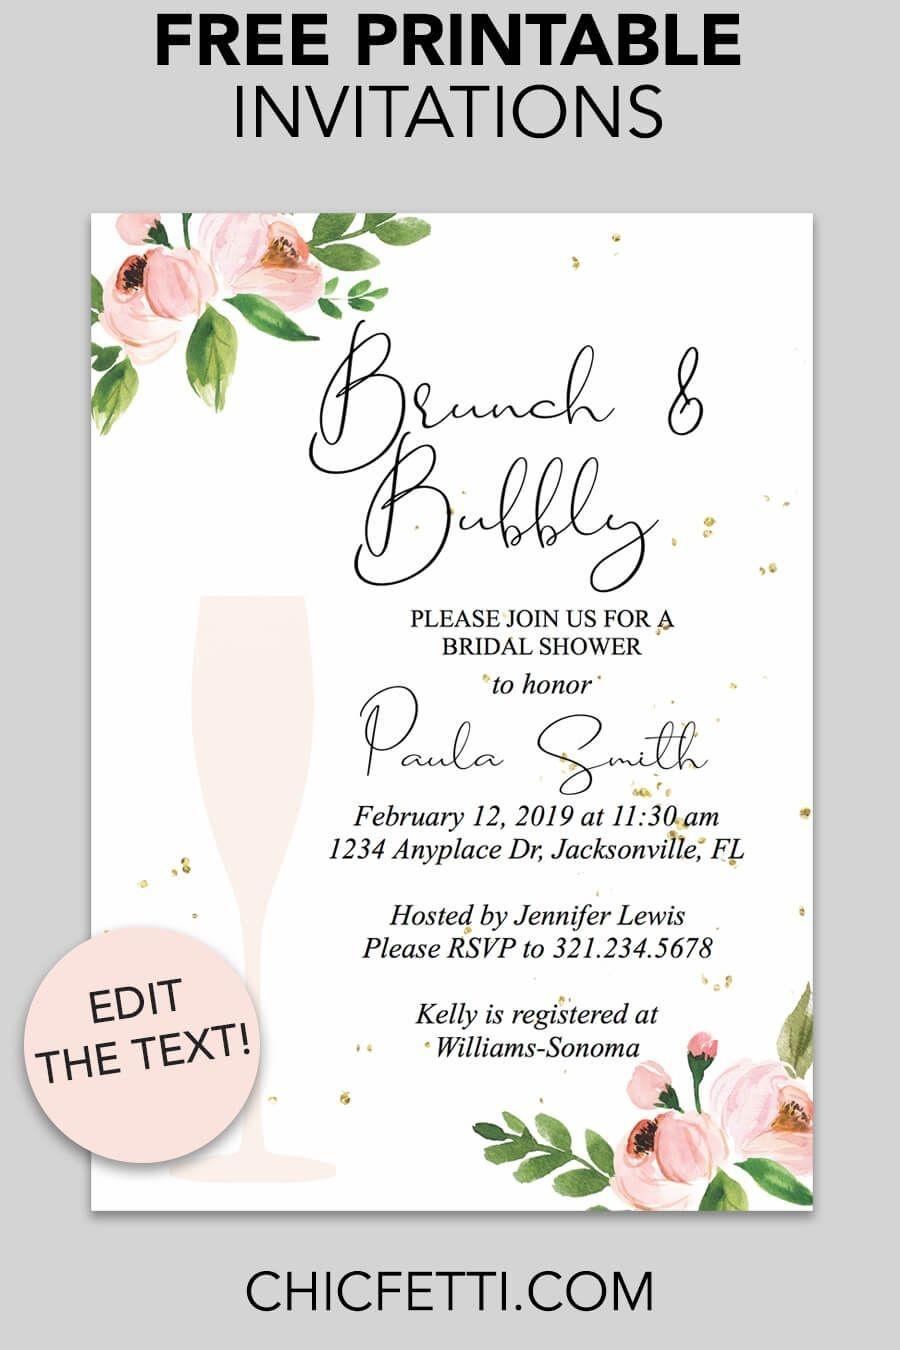 Bridal Shower Printable Invitation (Floral Bubbly   Invitations - Free Printable Wedding Invitations Templates Downloads